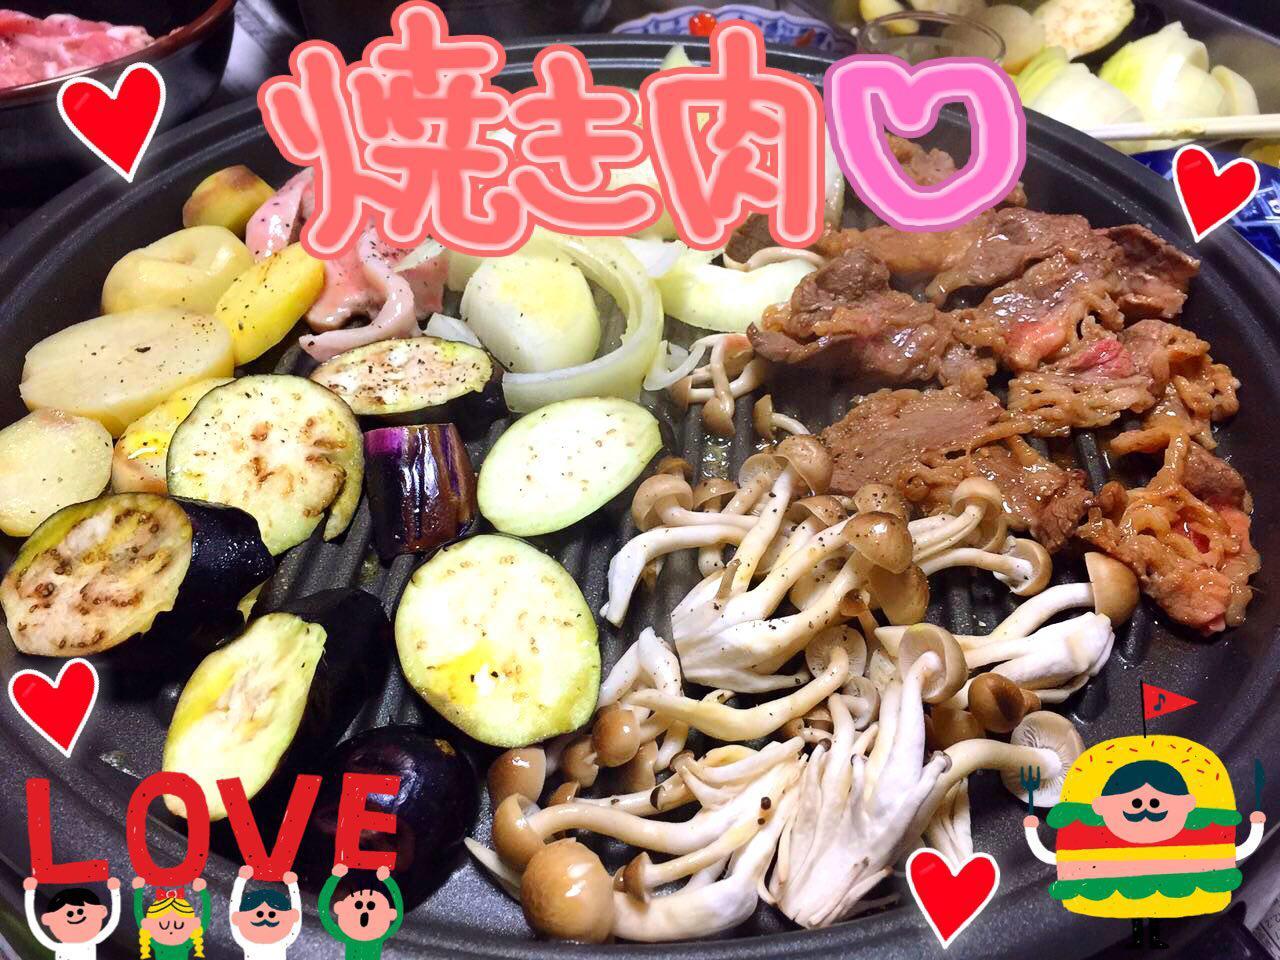 photo_2017-04-09_22-52-13.jpg